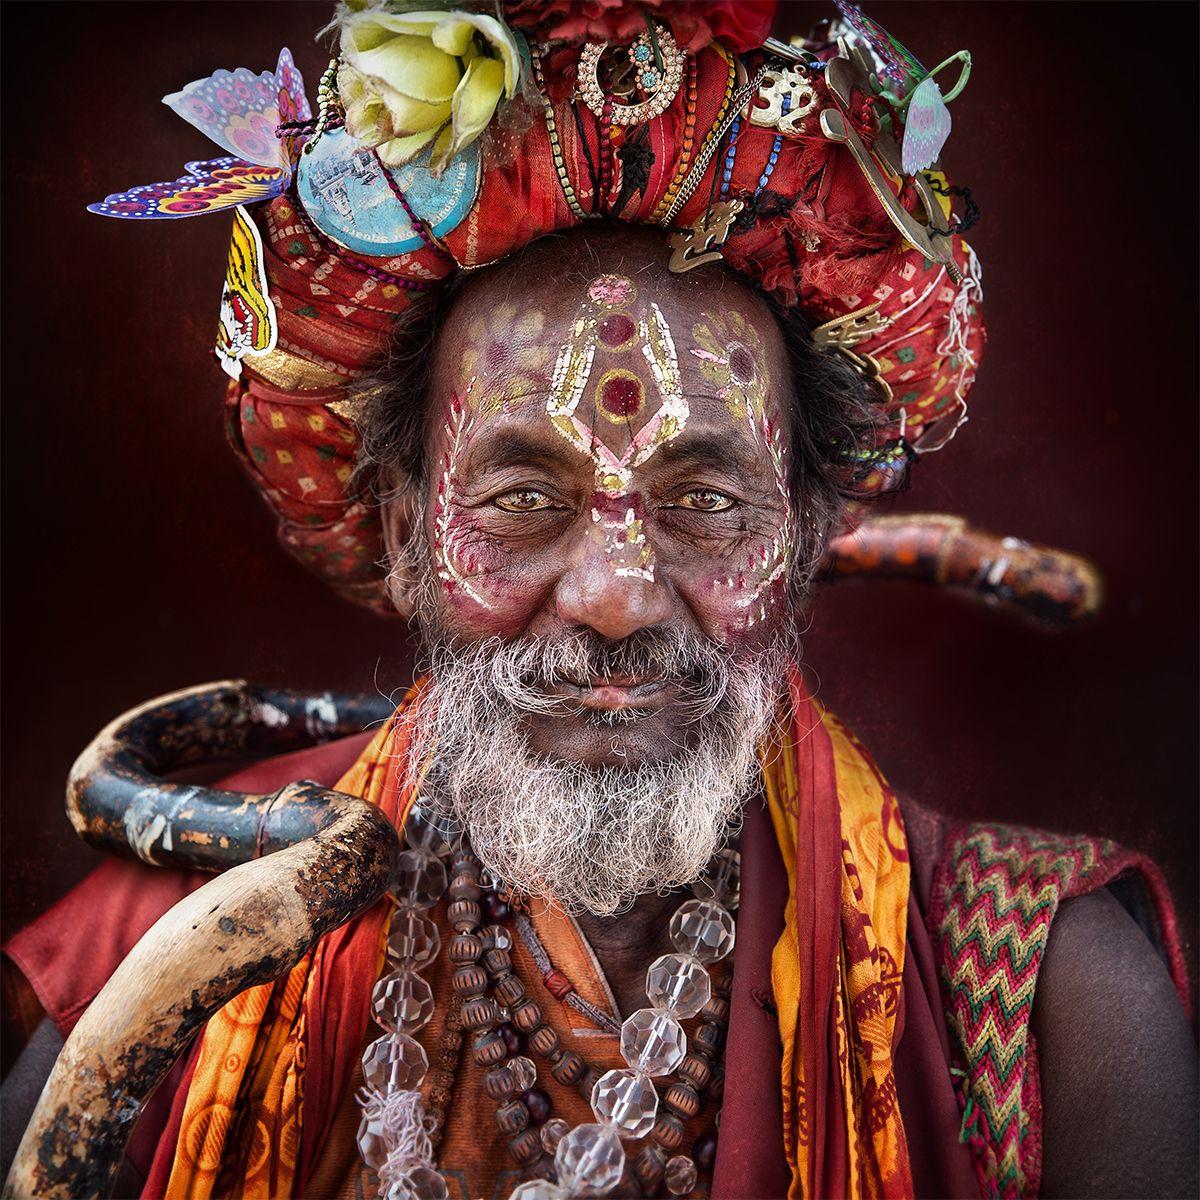 Странствующий паломник Автор фото: Раед Аммари.